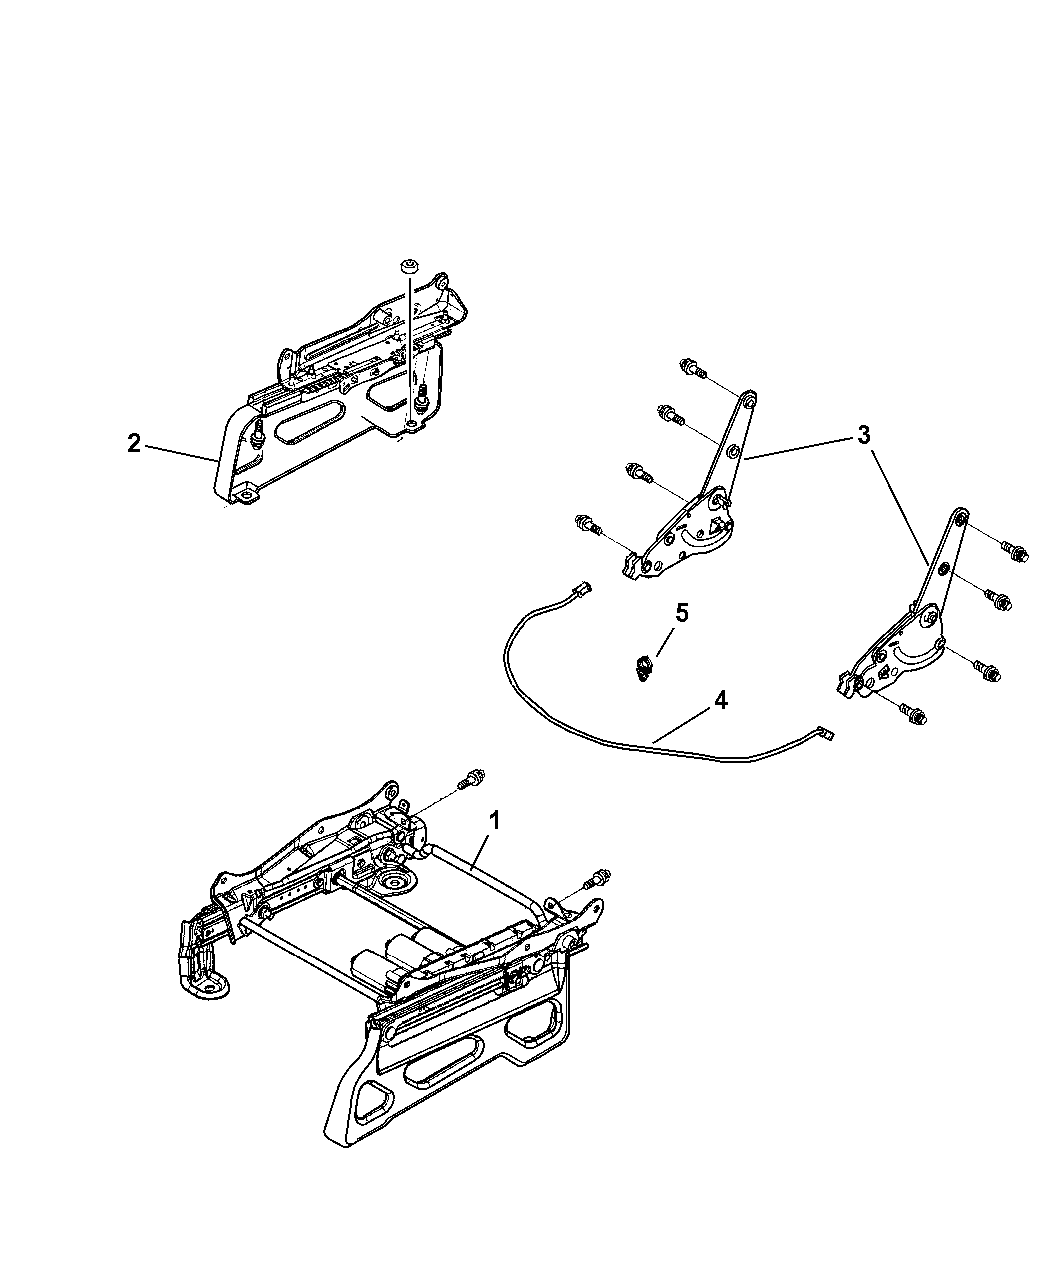 2009 Dodge Nitro Risers Miscellaneous Front Seat Attachments Engine Diagram